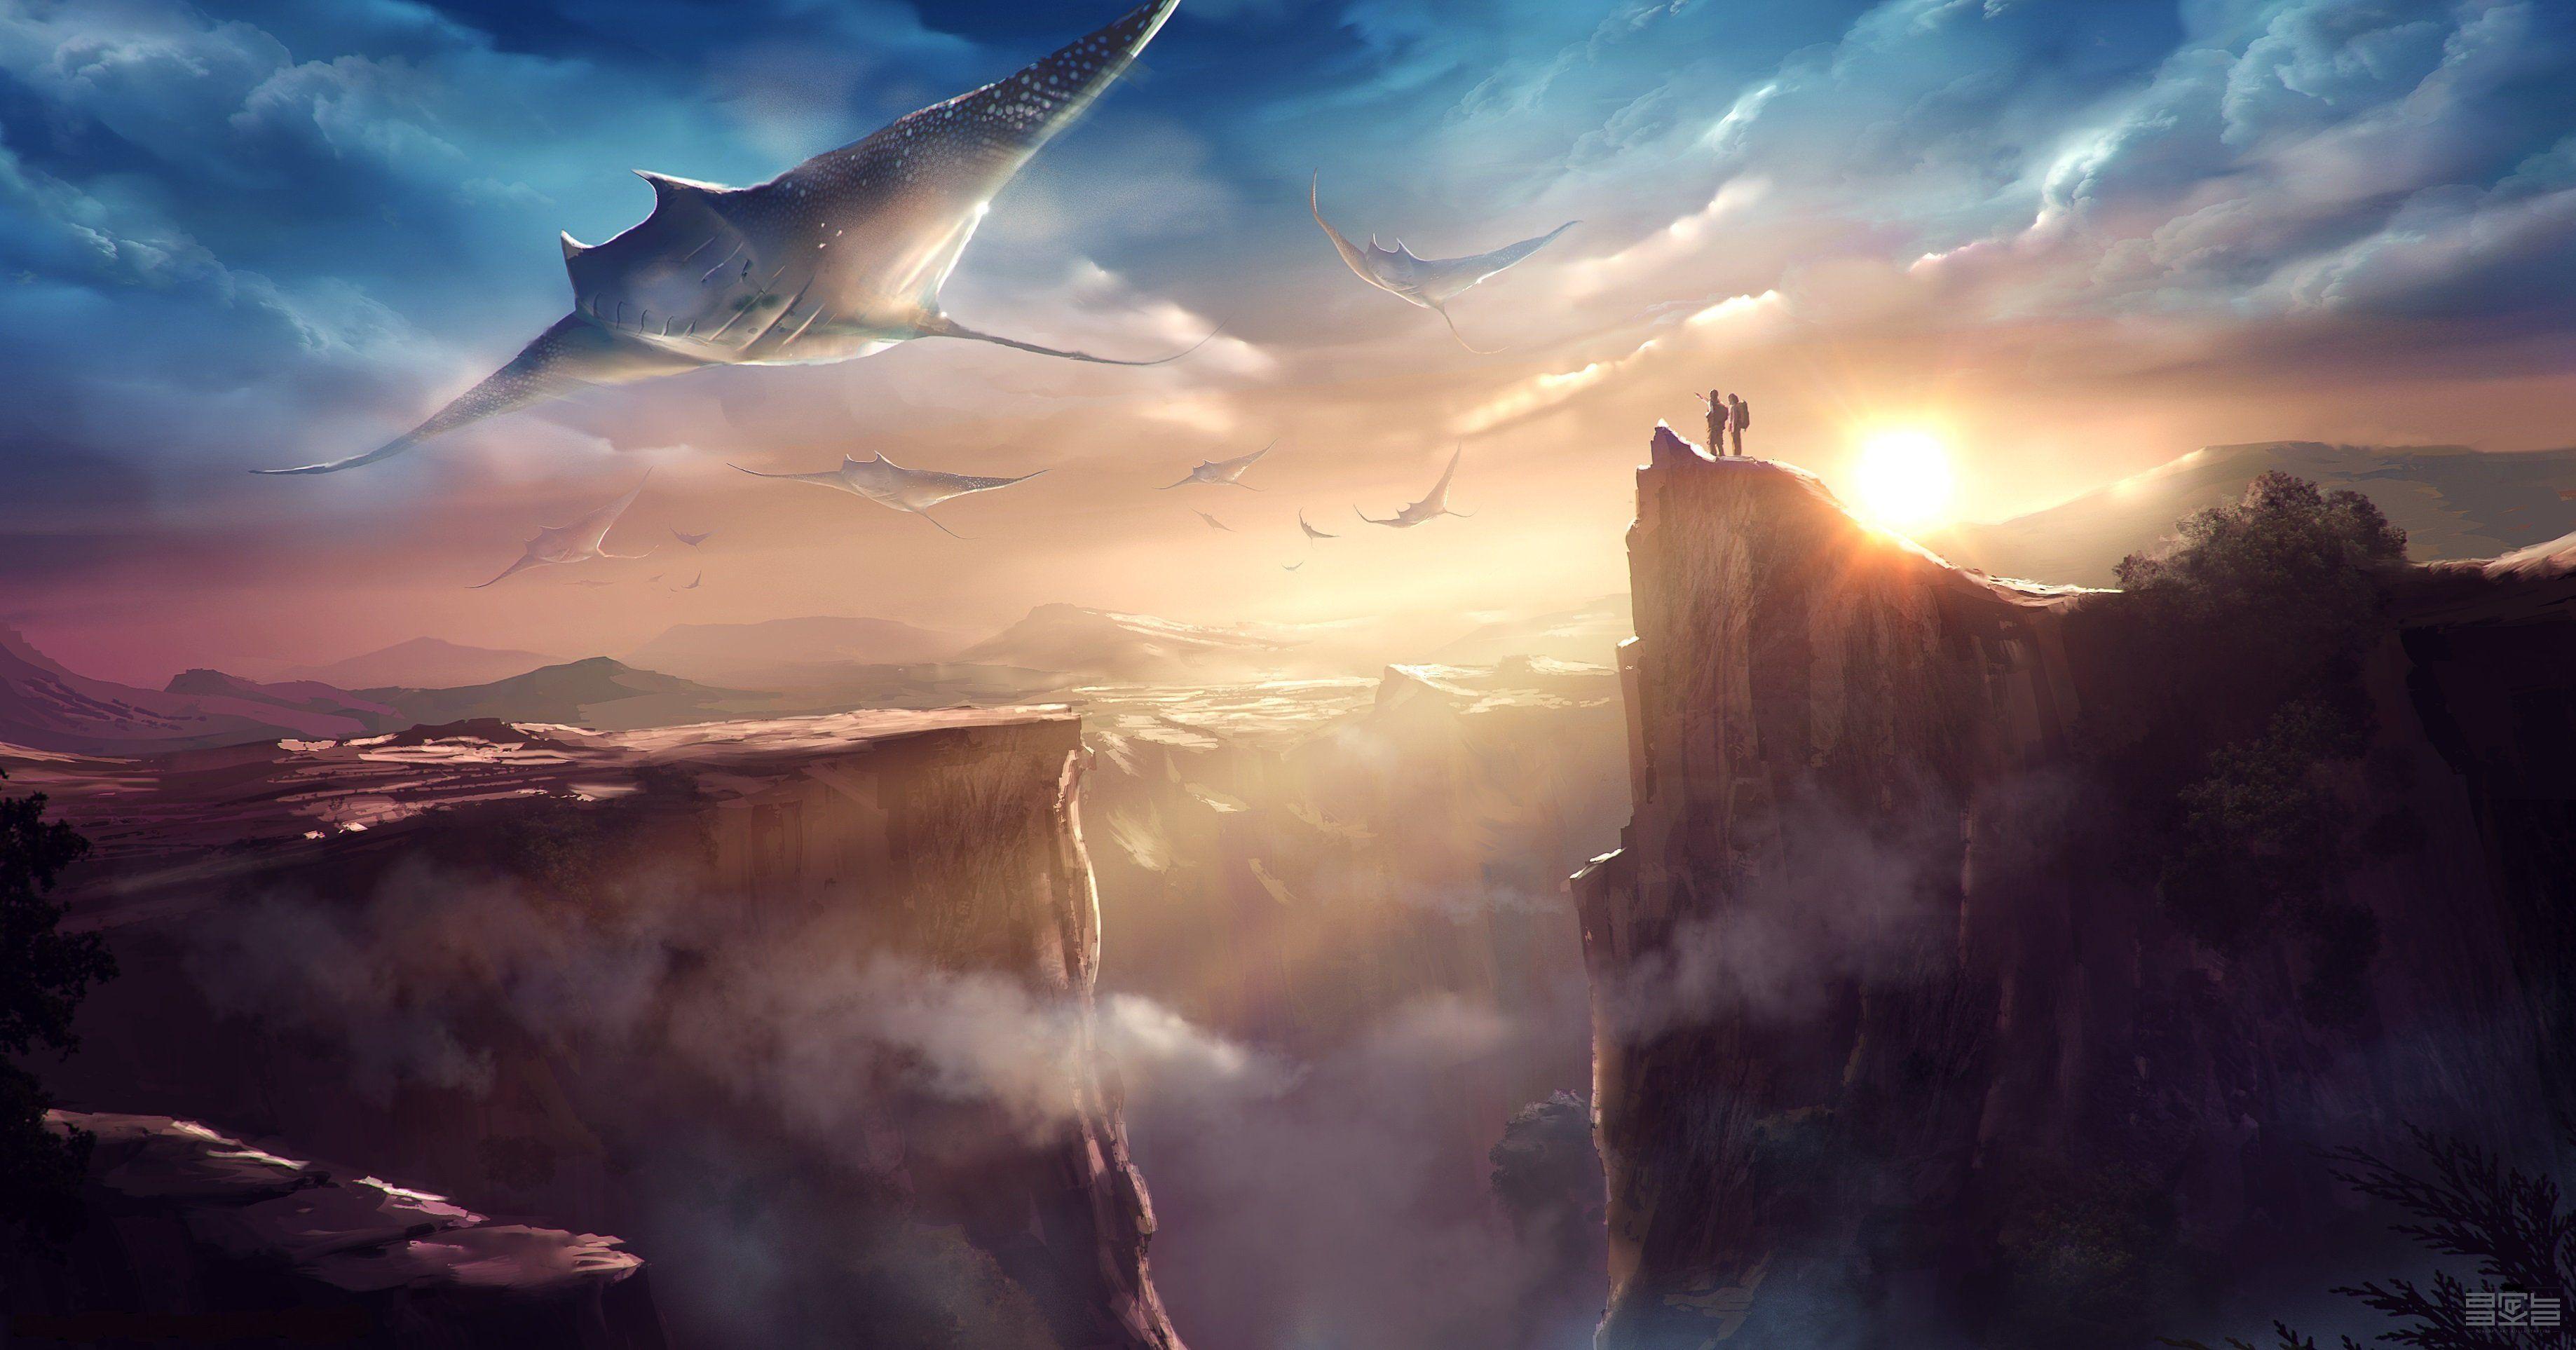 fantasy sci fi wallpaper 29266 hd wallpapers background t